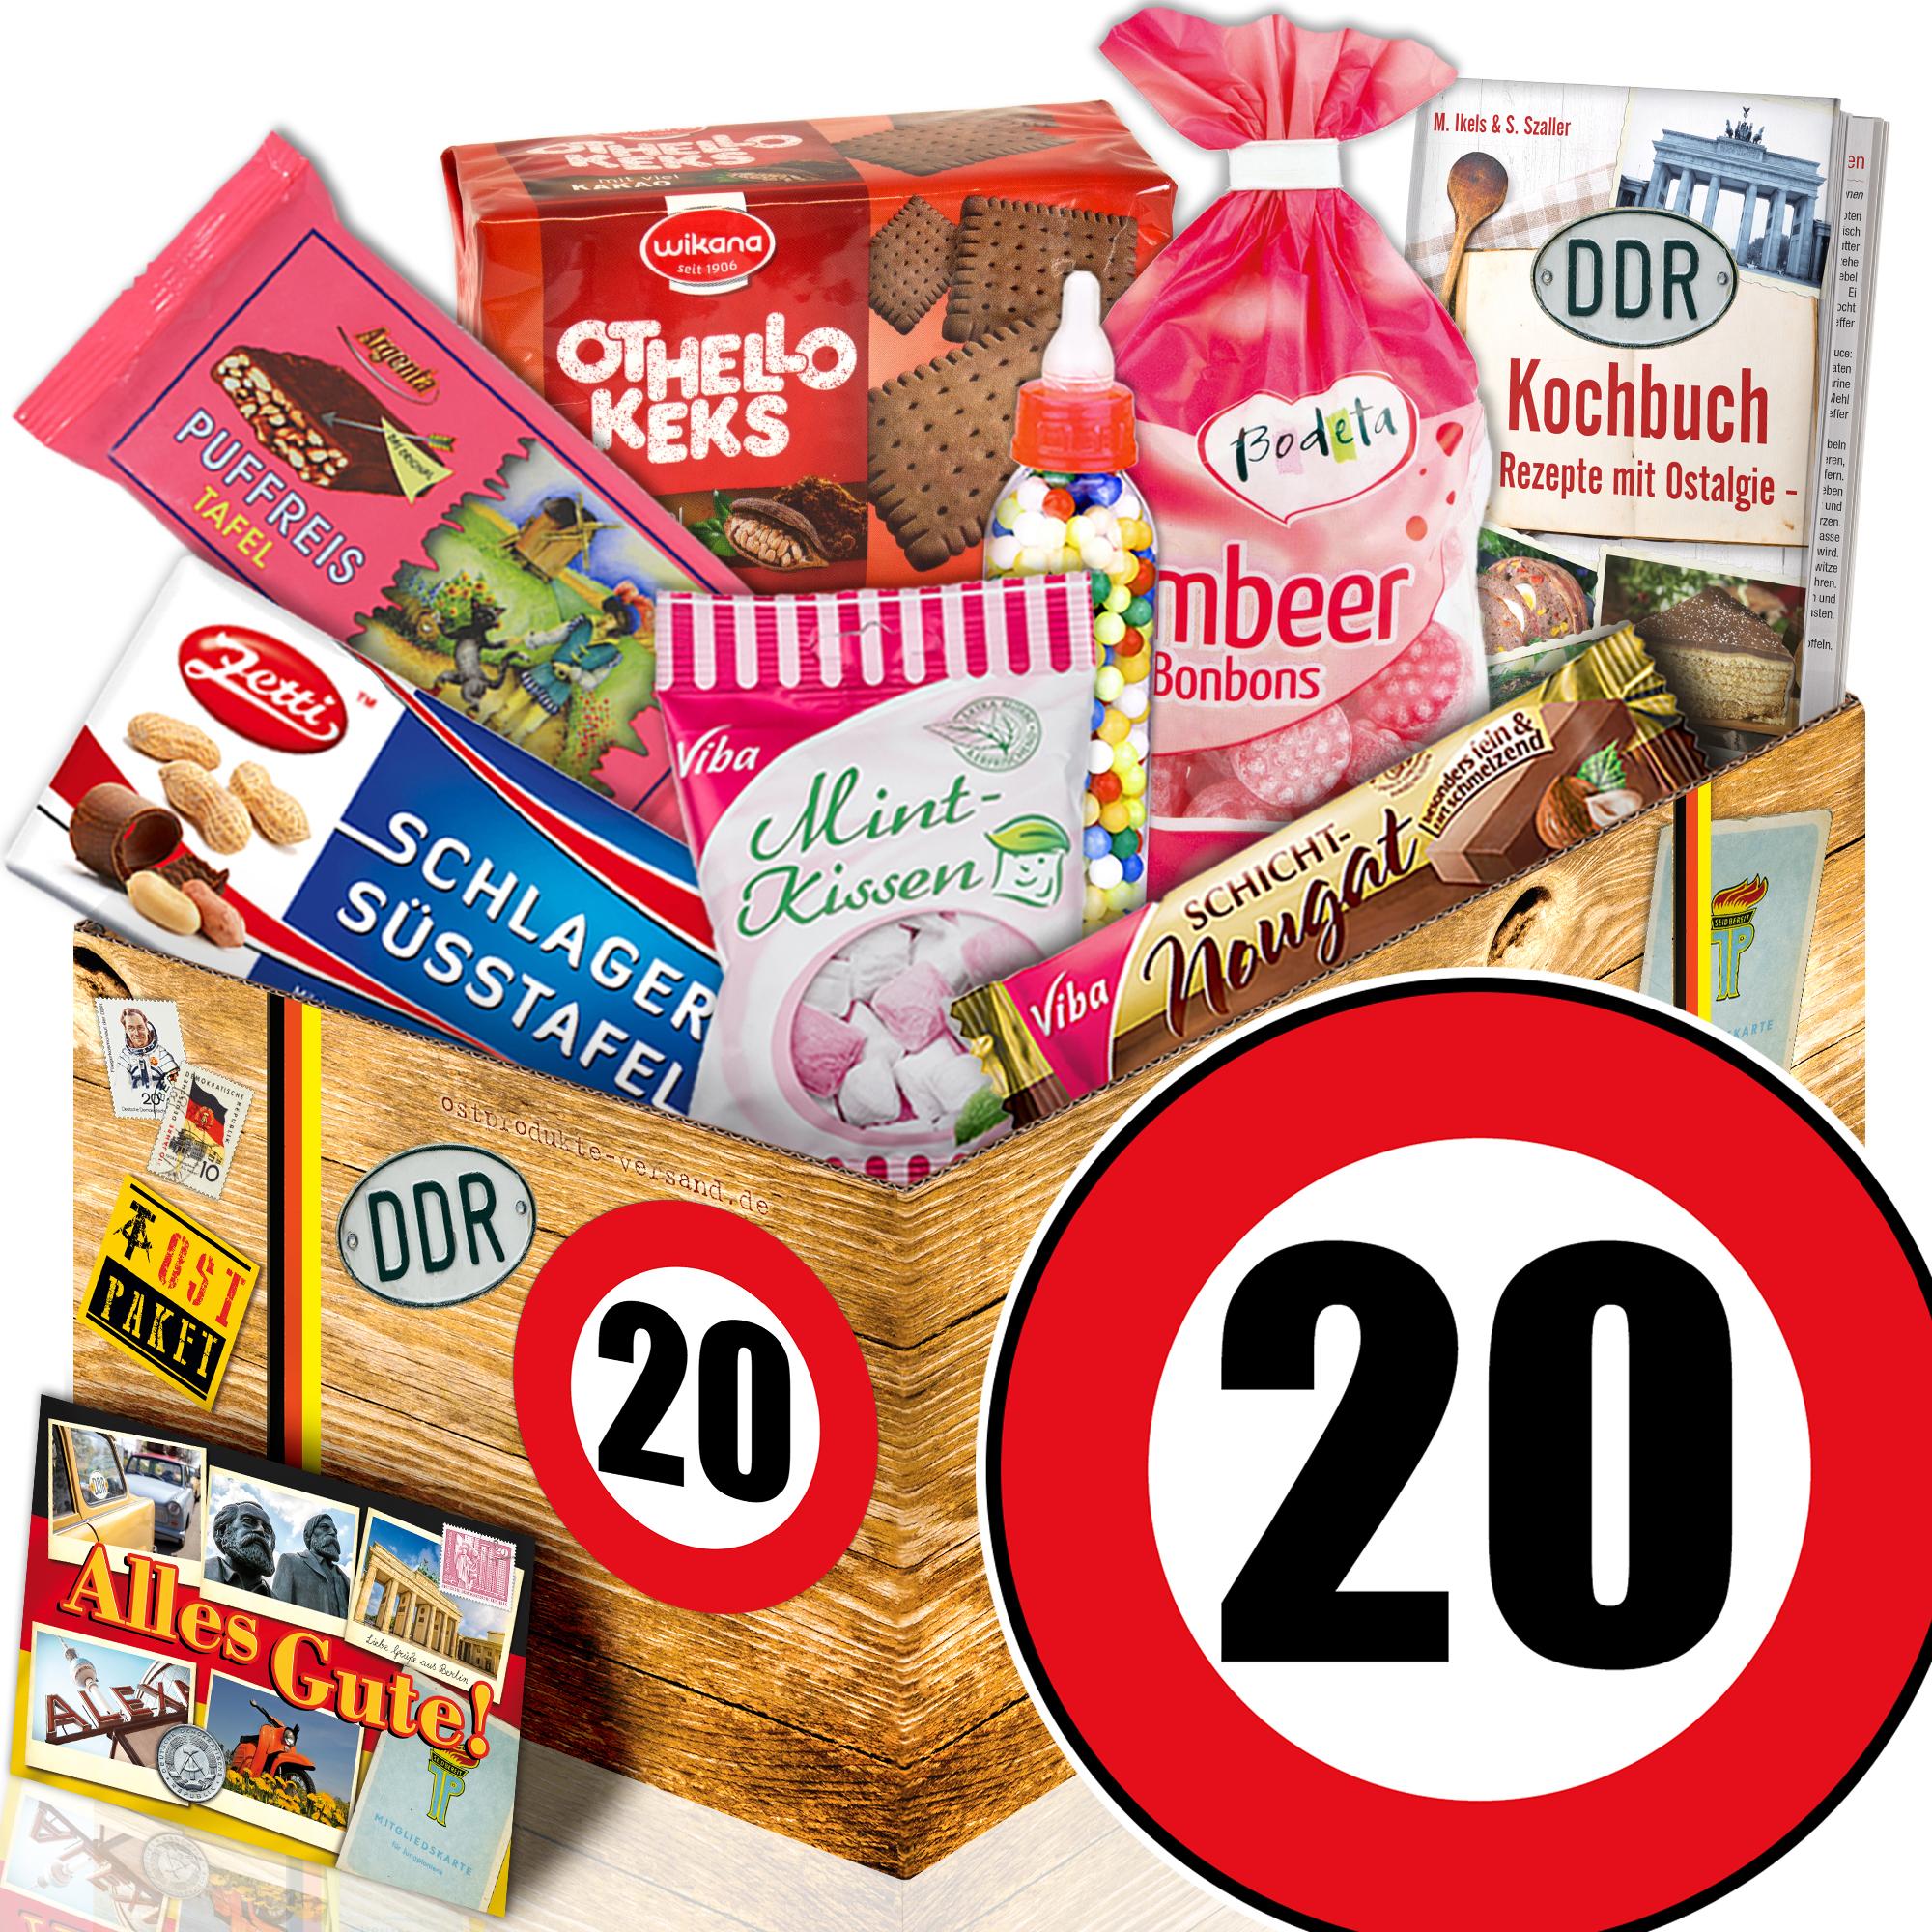 Zahl Smoothie Kit 20 20 Geburtstag Frau Geschenke Ncci1914com